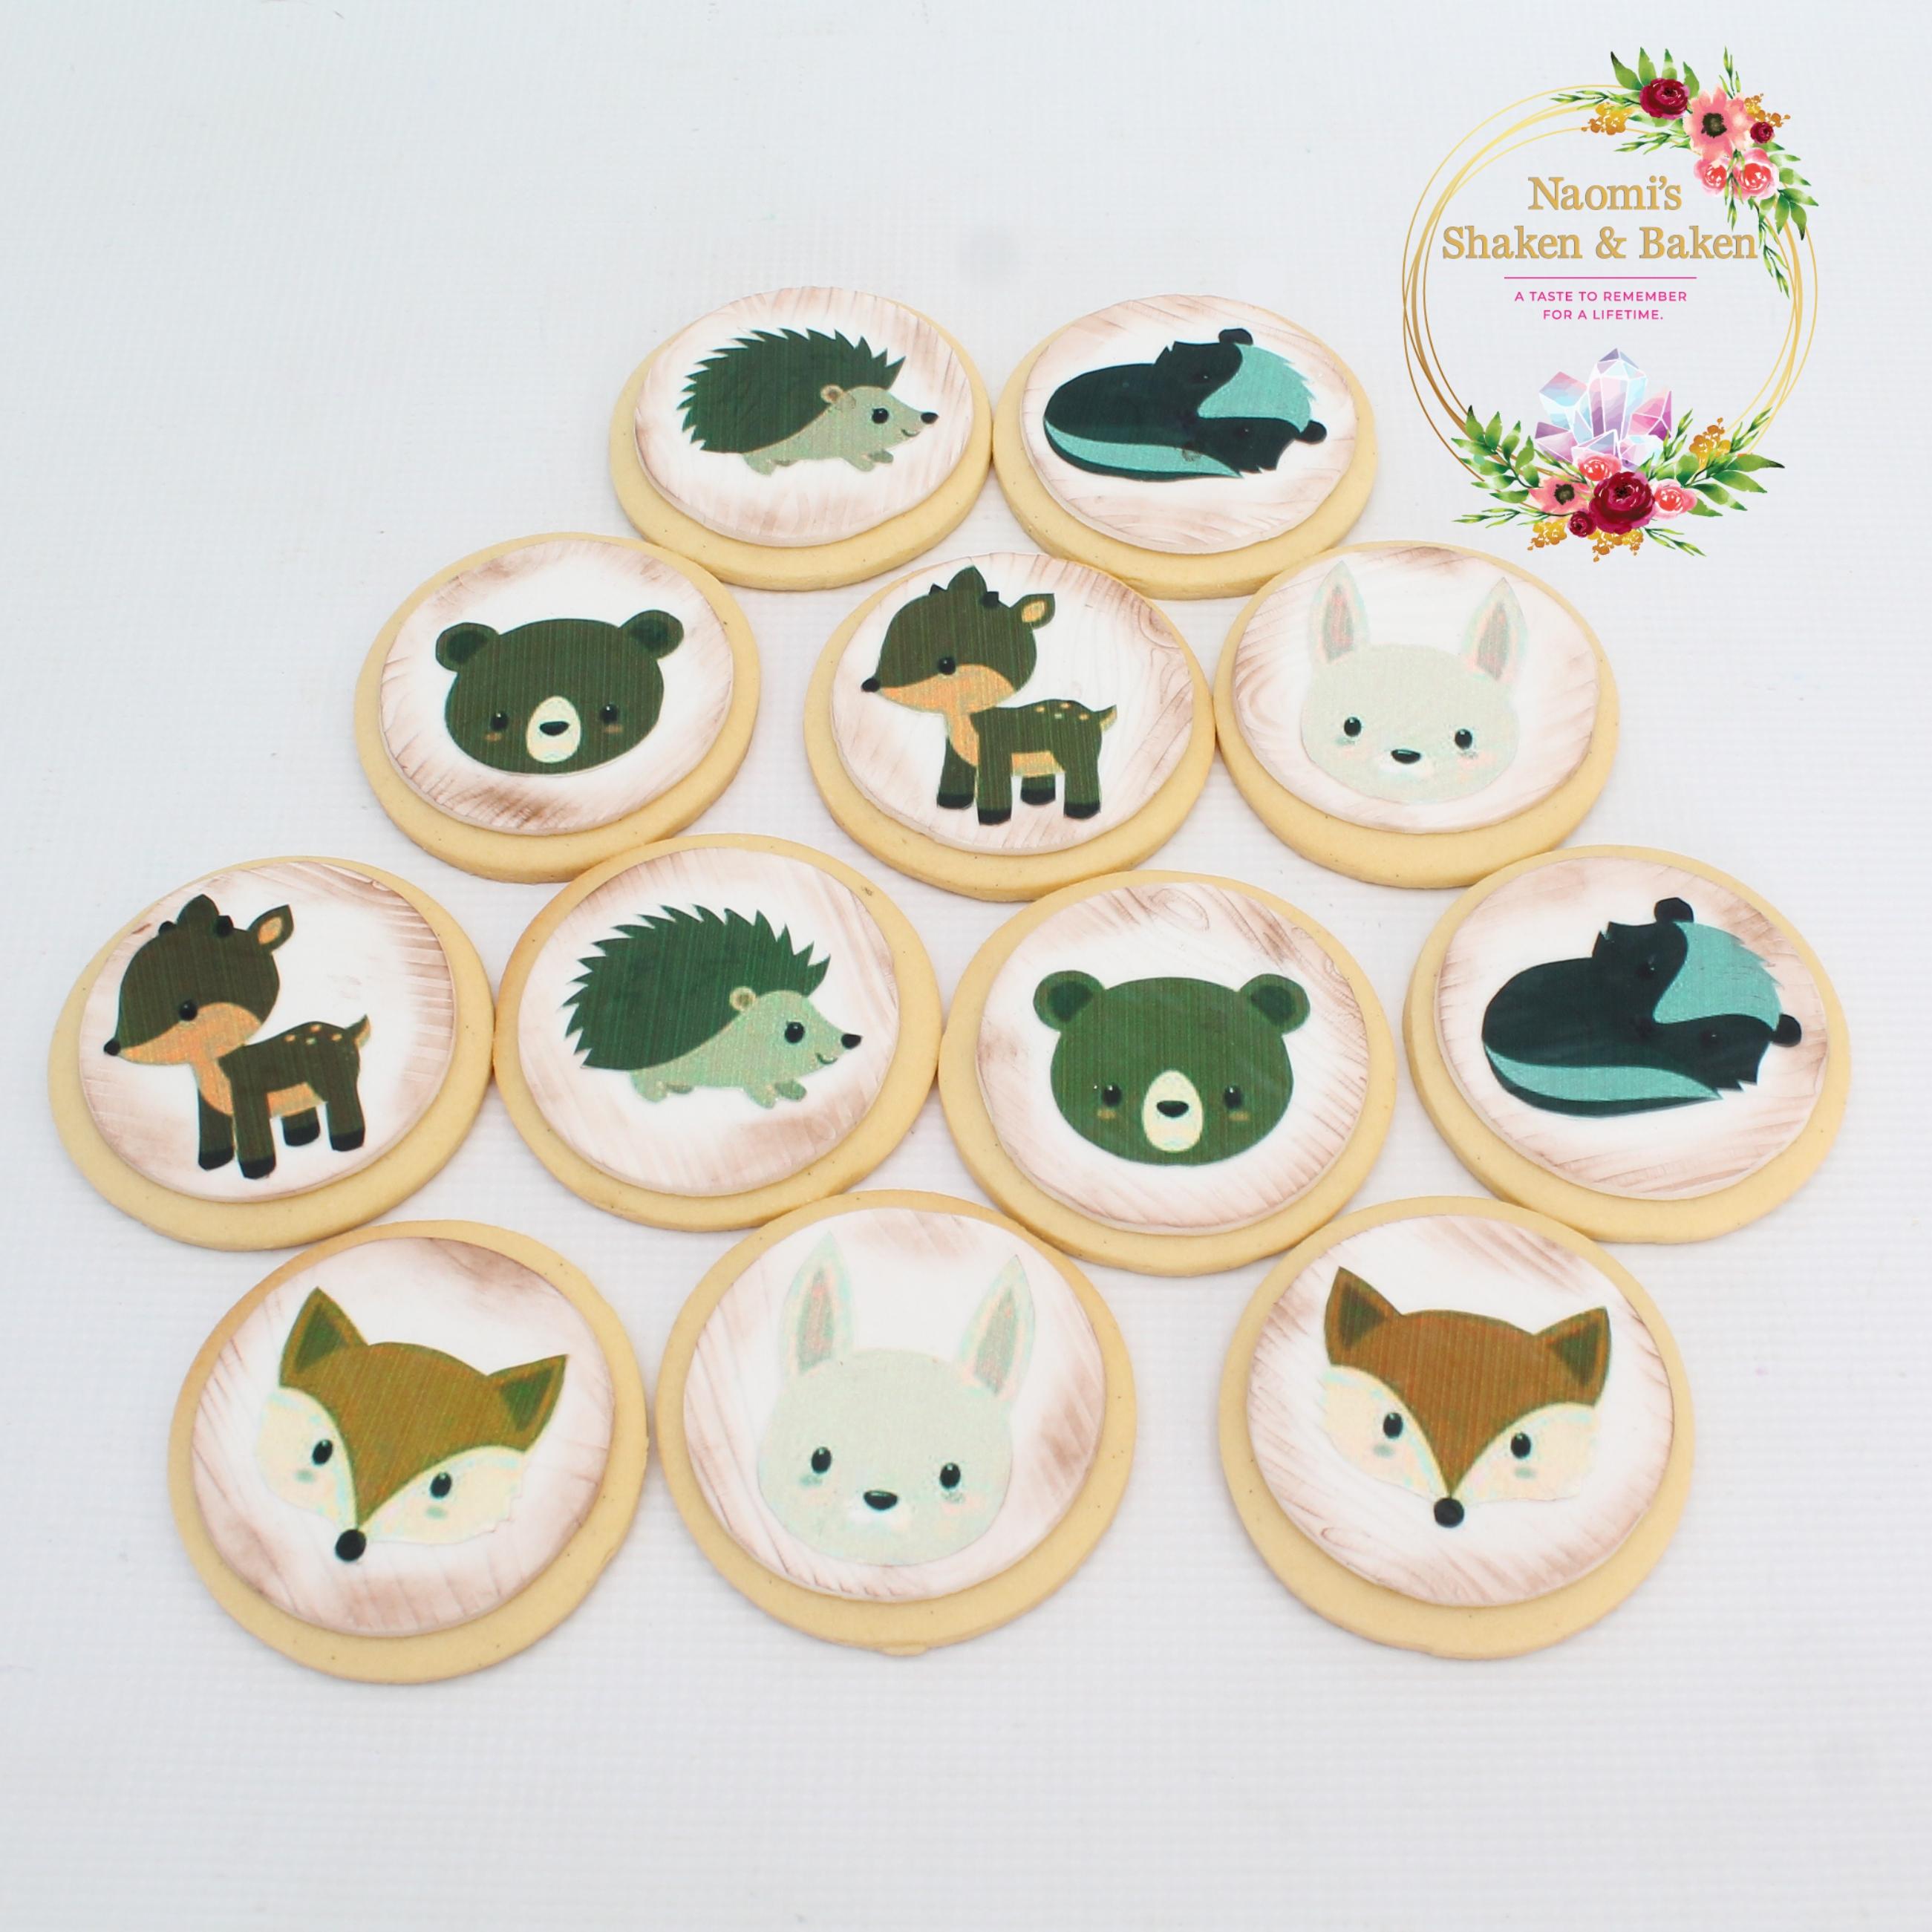 Printed Edible Image Woodland Animal Cookies